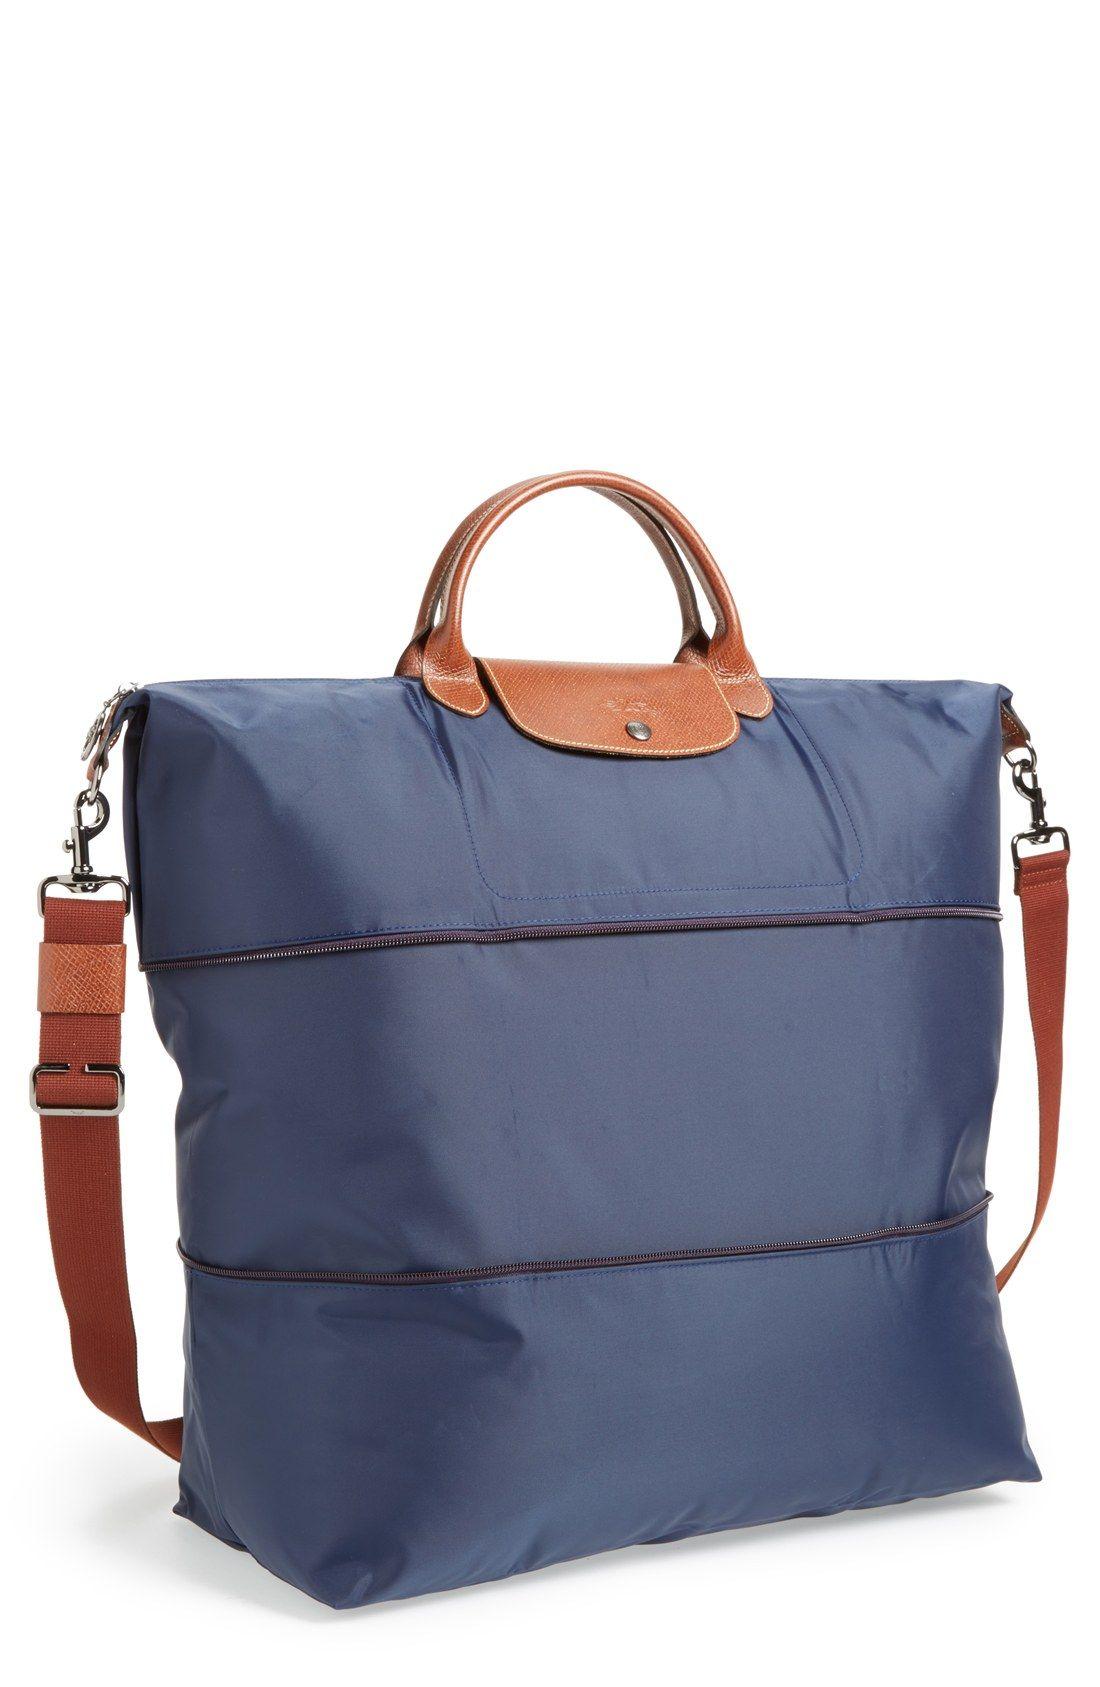 Le Pliage' Expandable Travel Bag | Longchamp, Bags and Travel